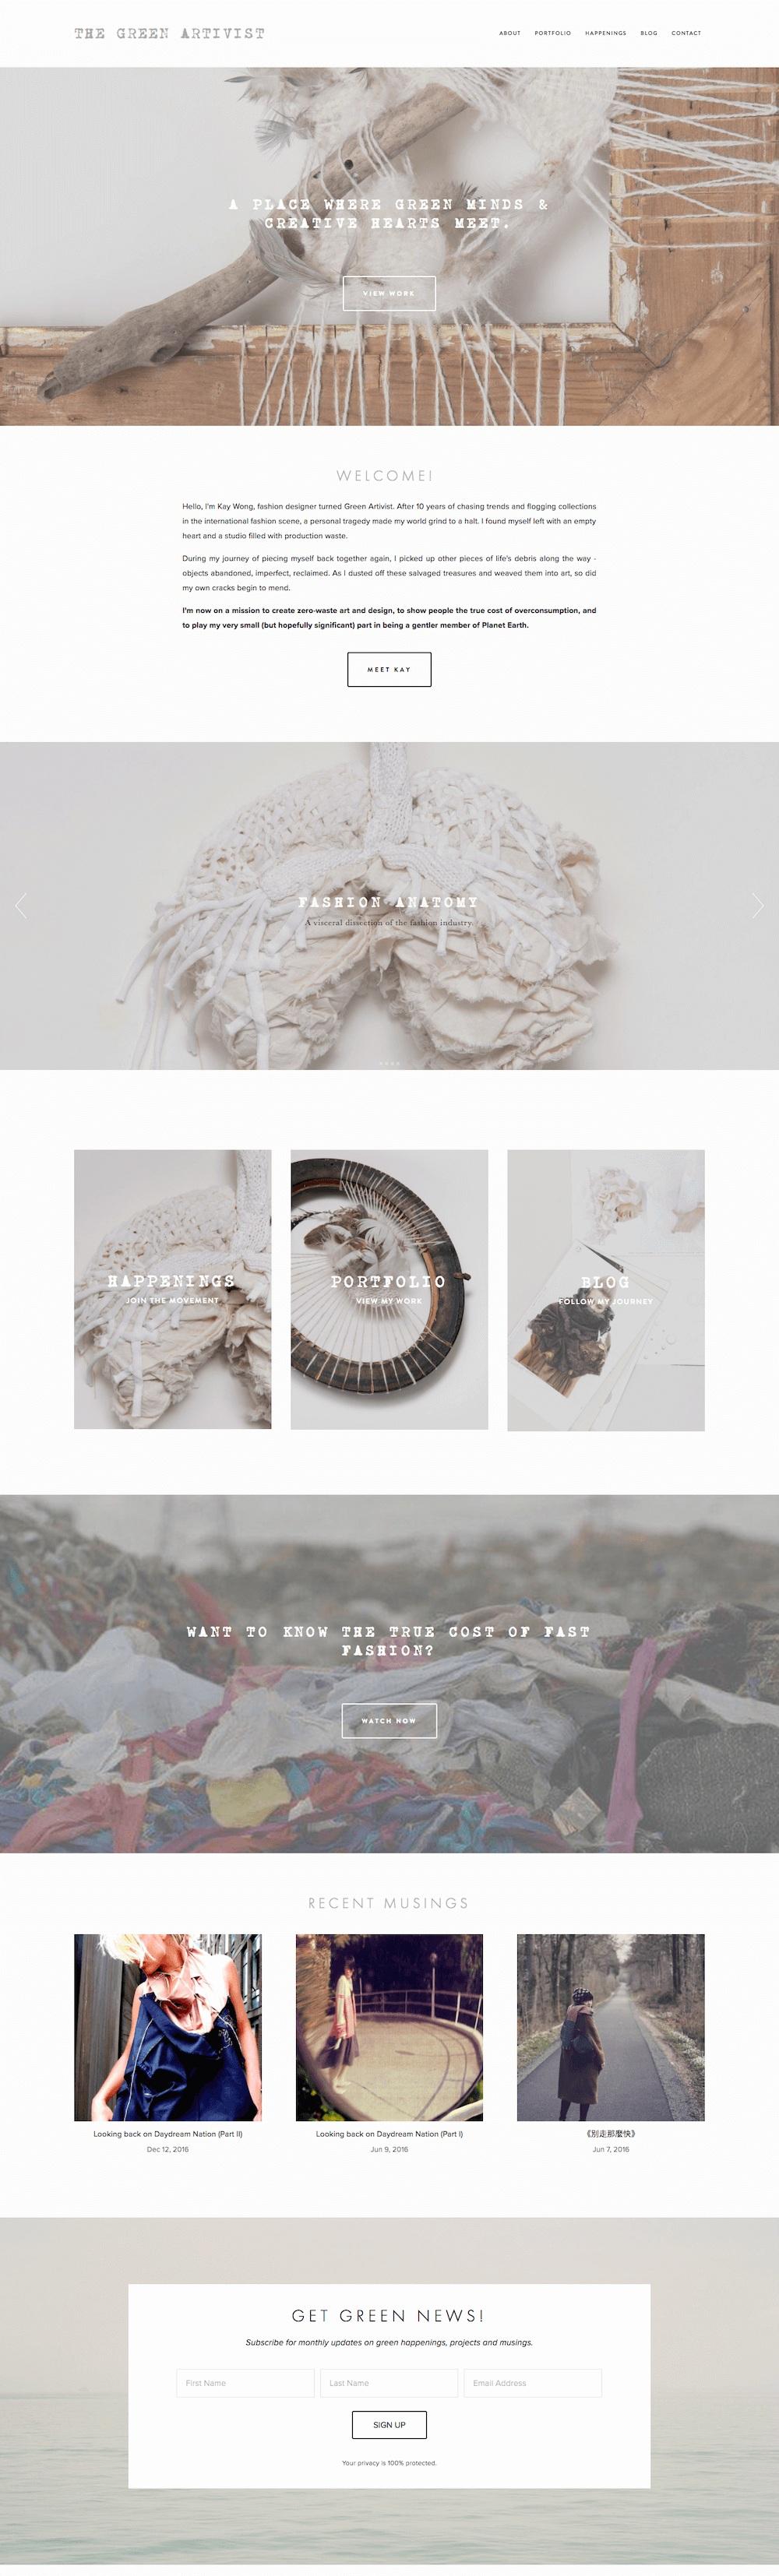 the+green+artivist+zeoni+creations+web+design.jpg